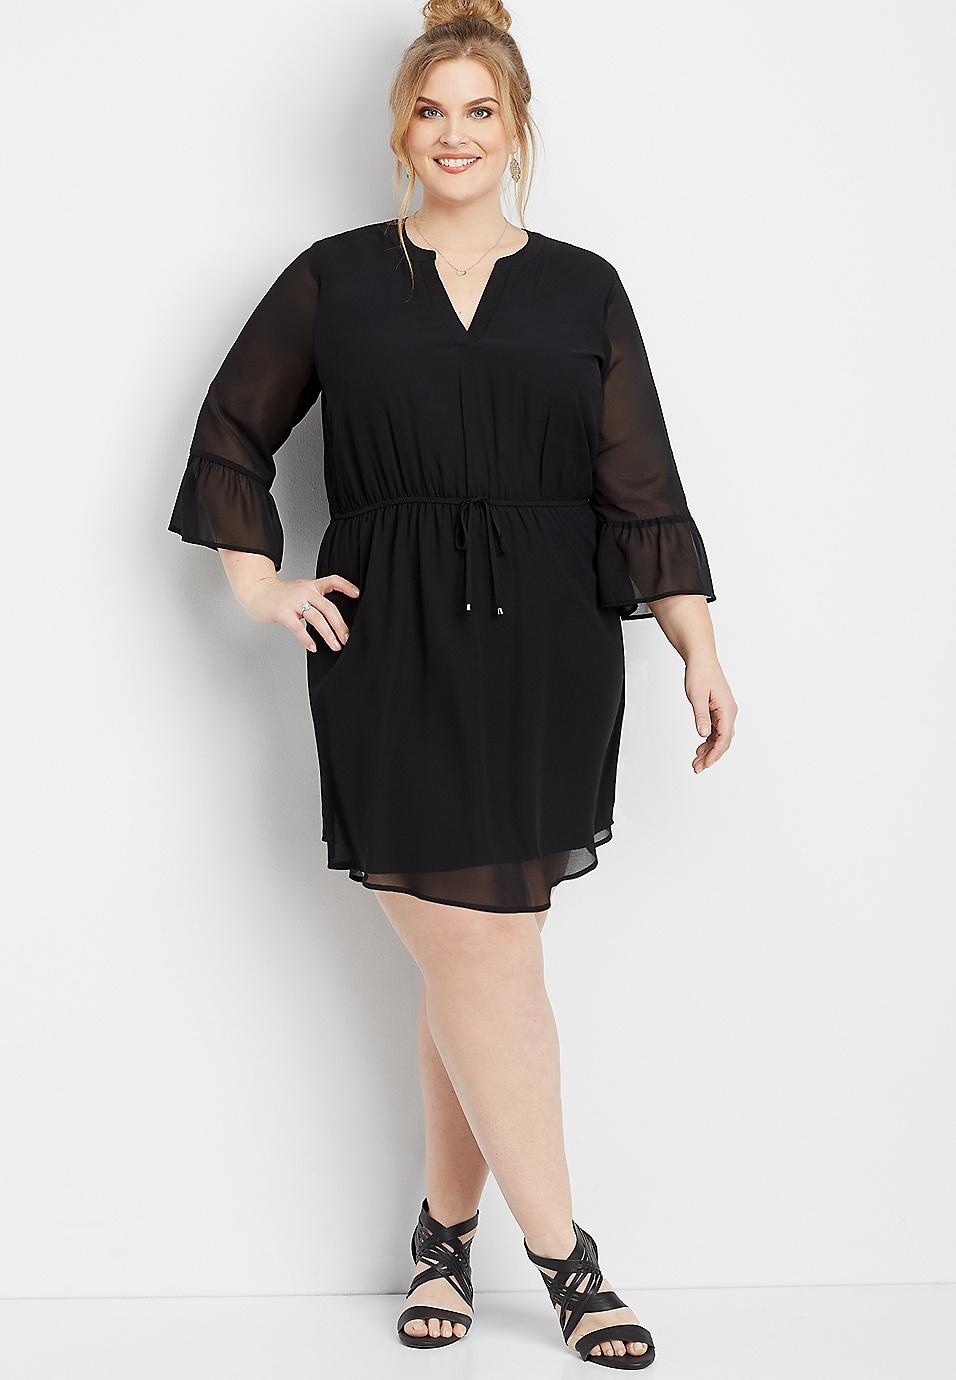 8d717228c8fb0 plus size bell sleeve v-neck dress